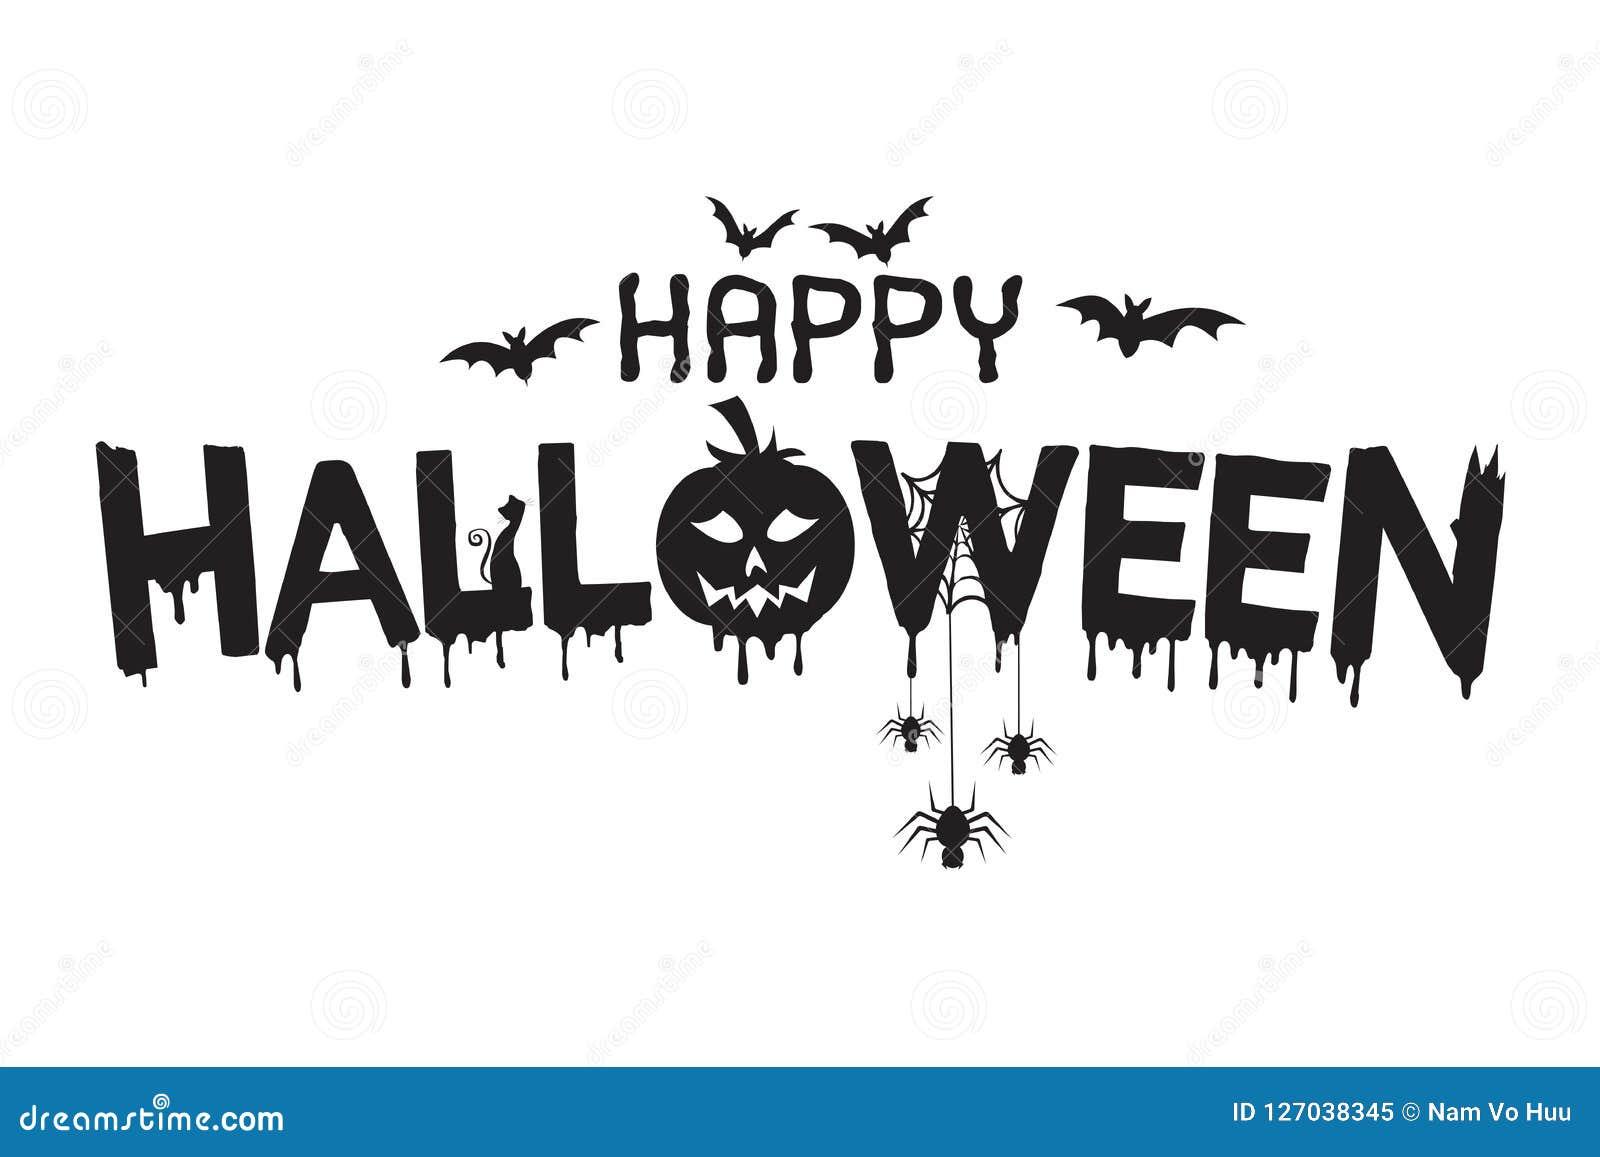 Happy Halloween Lettering Illustration Stock Vector Illustration Of Illustrated Black 127038345